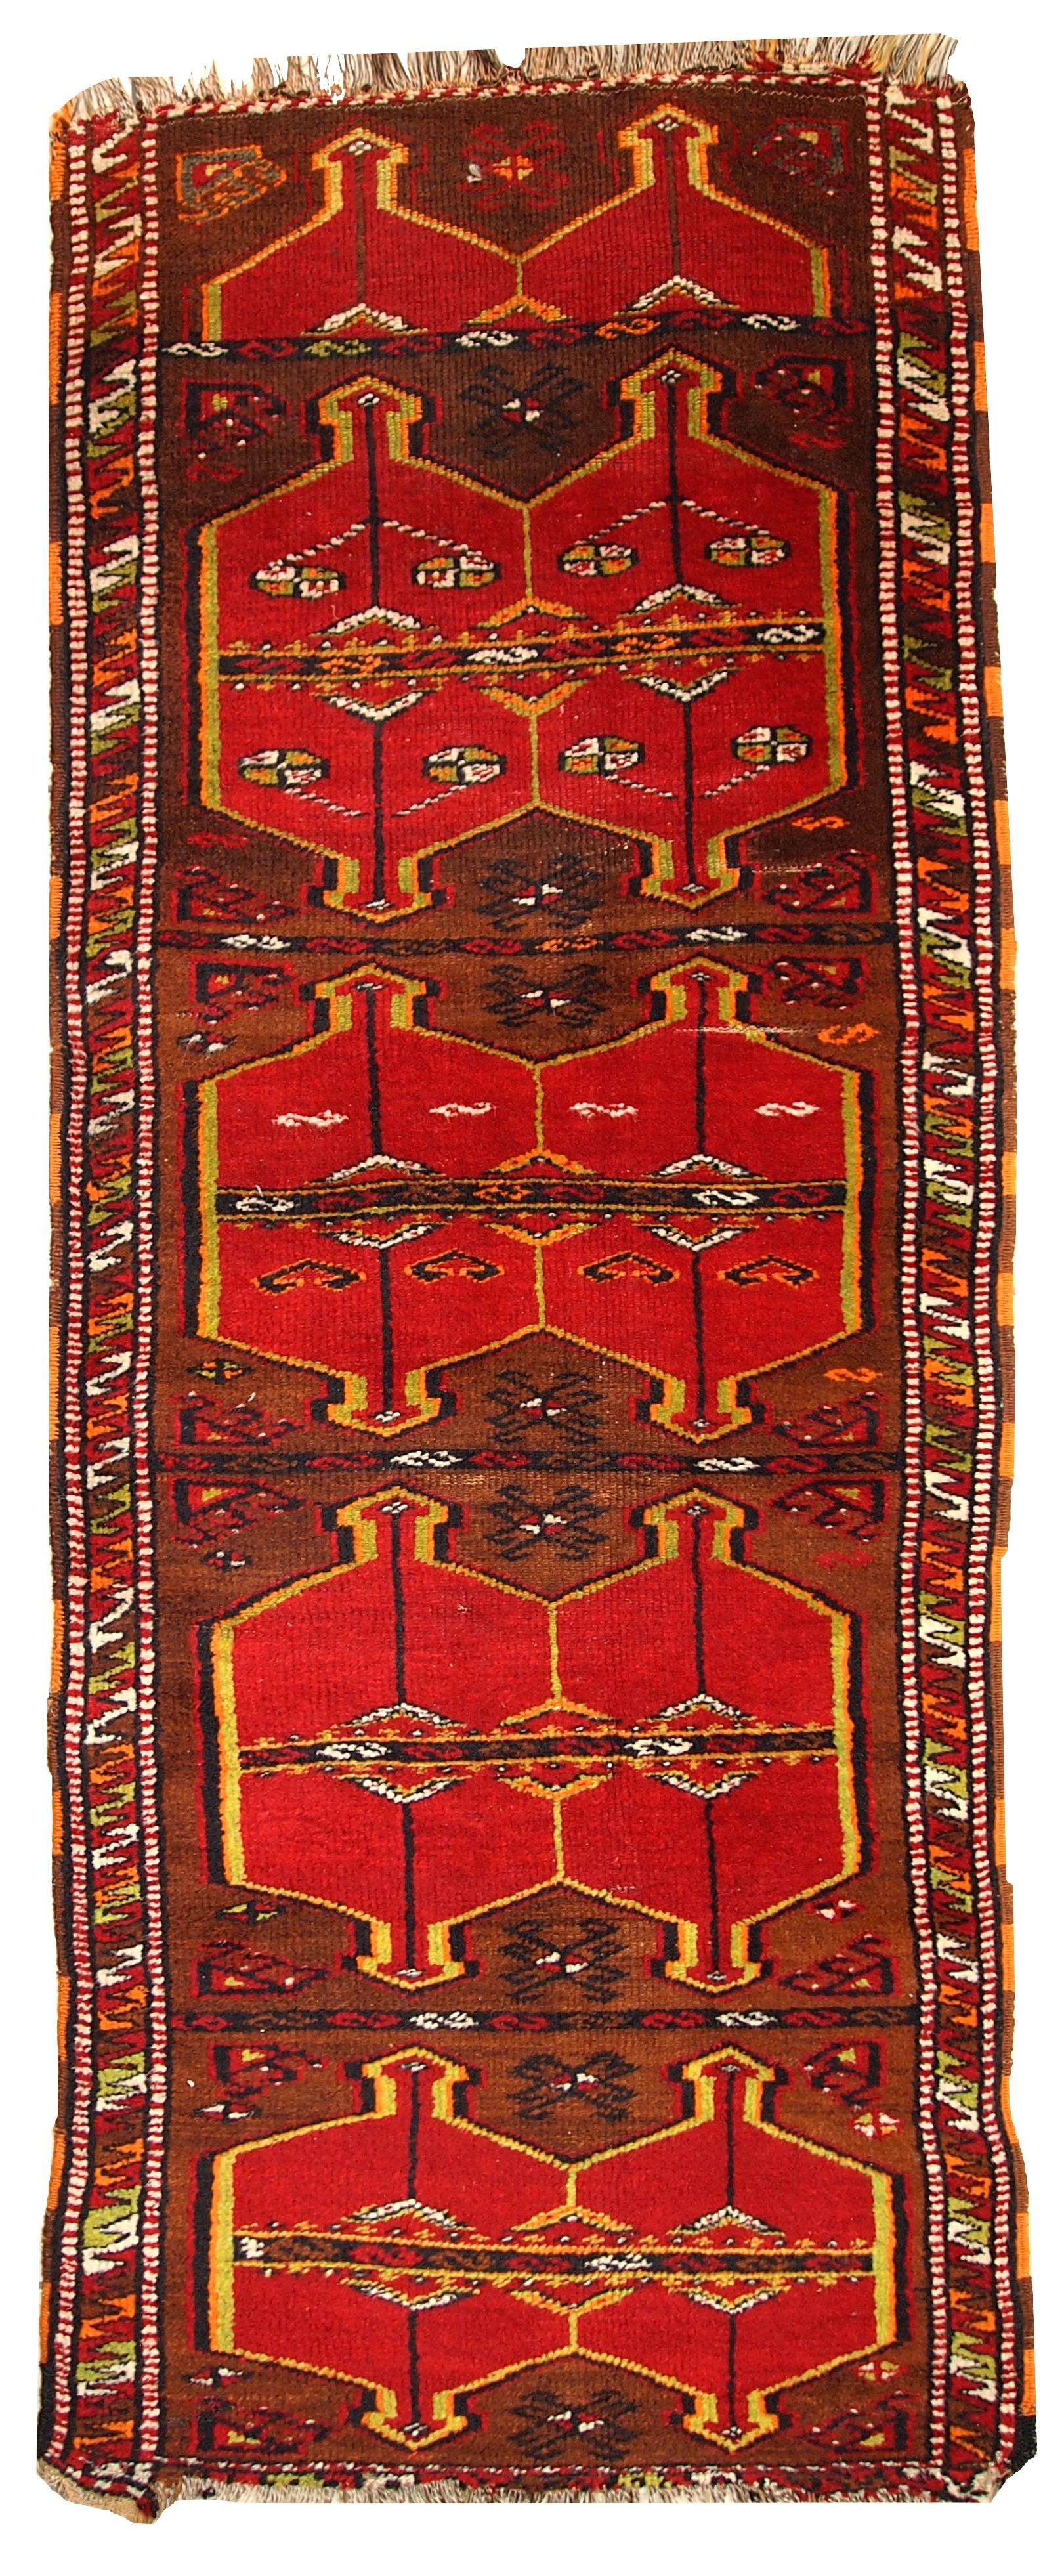 Handmade Antique Collectible Turkish Yastik Rug